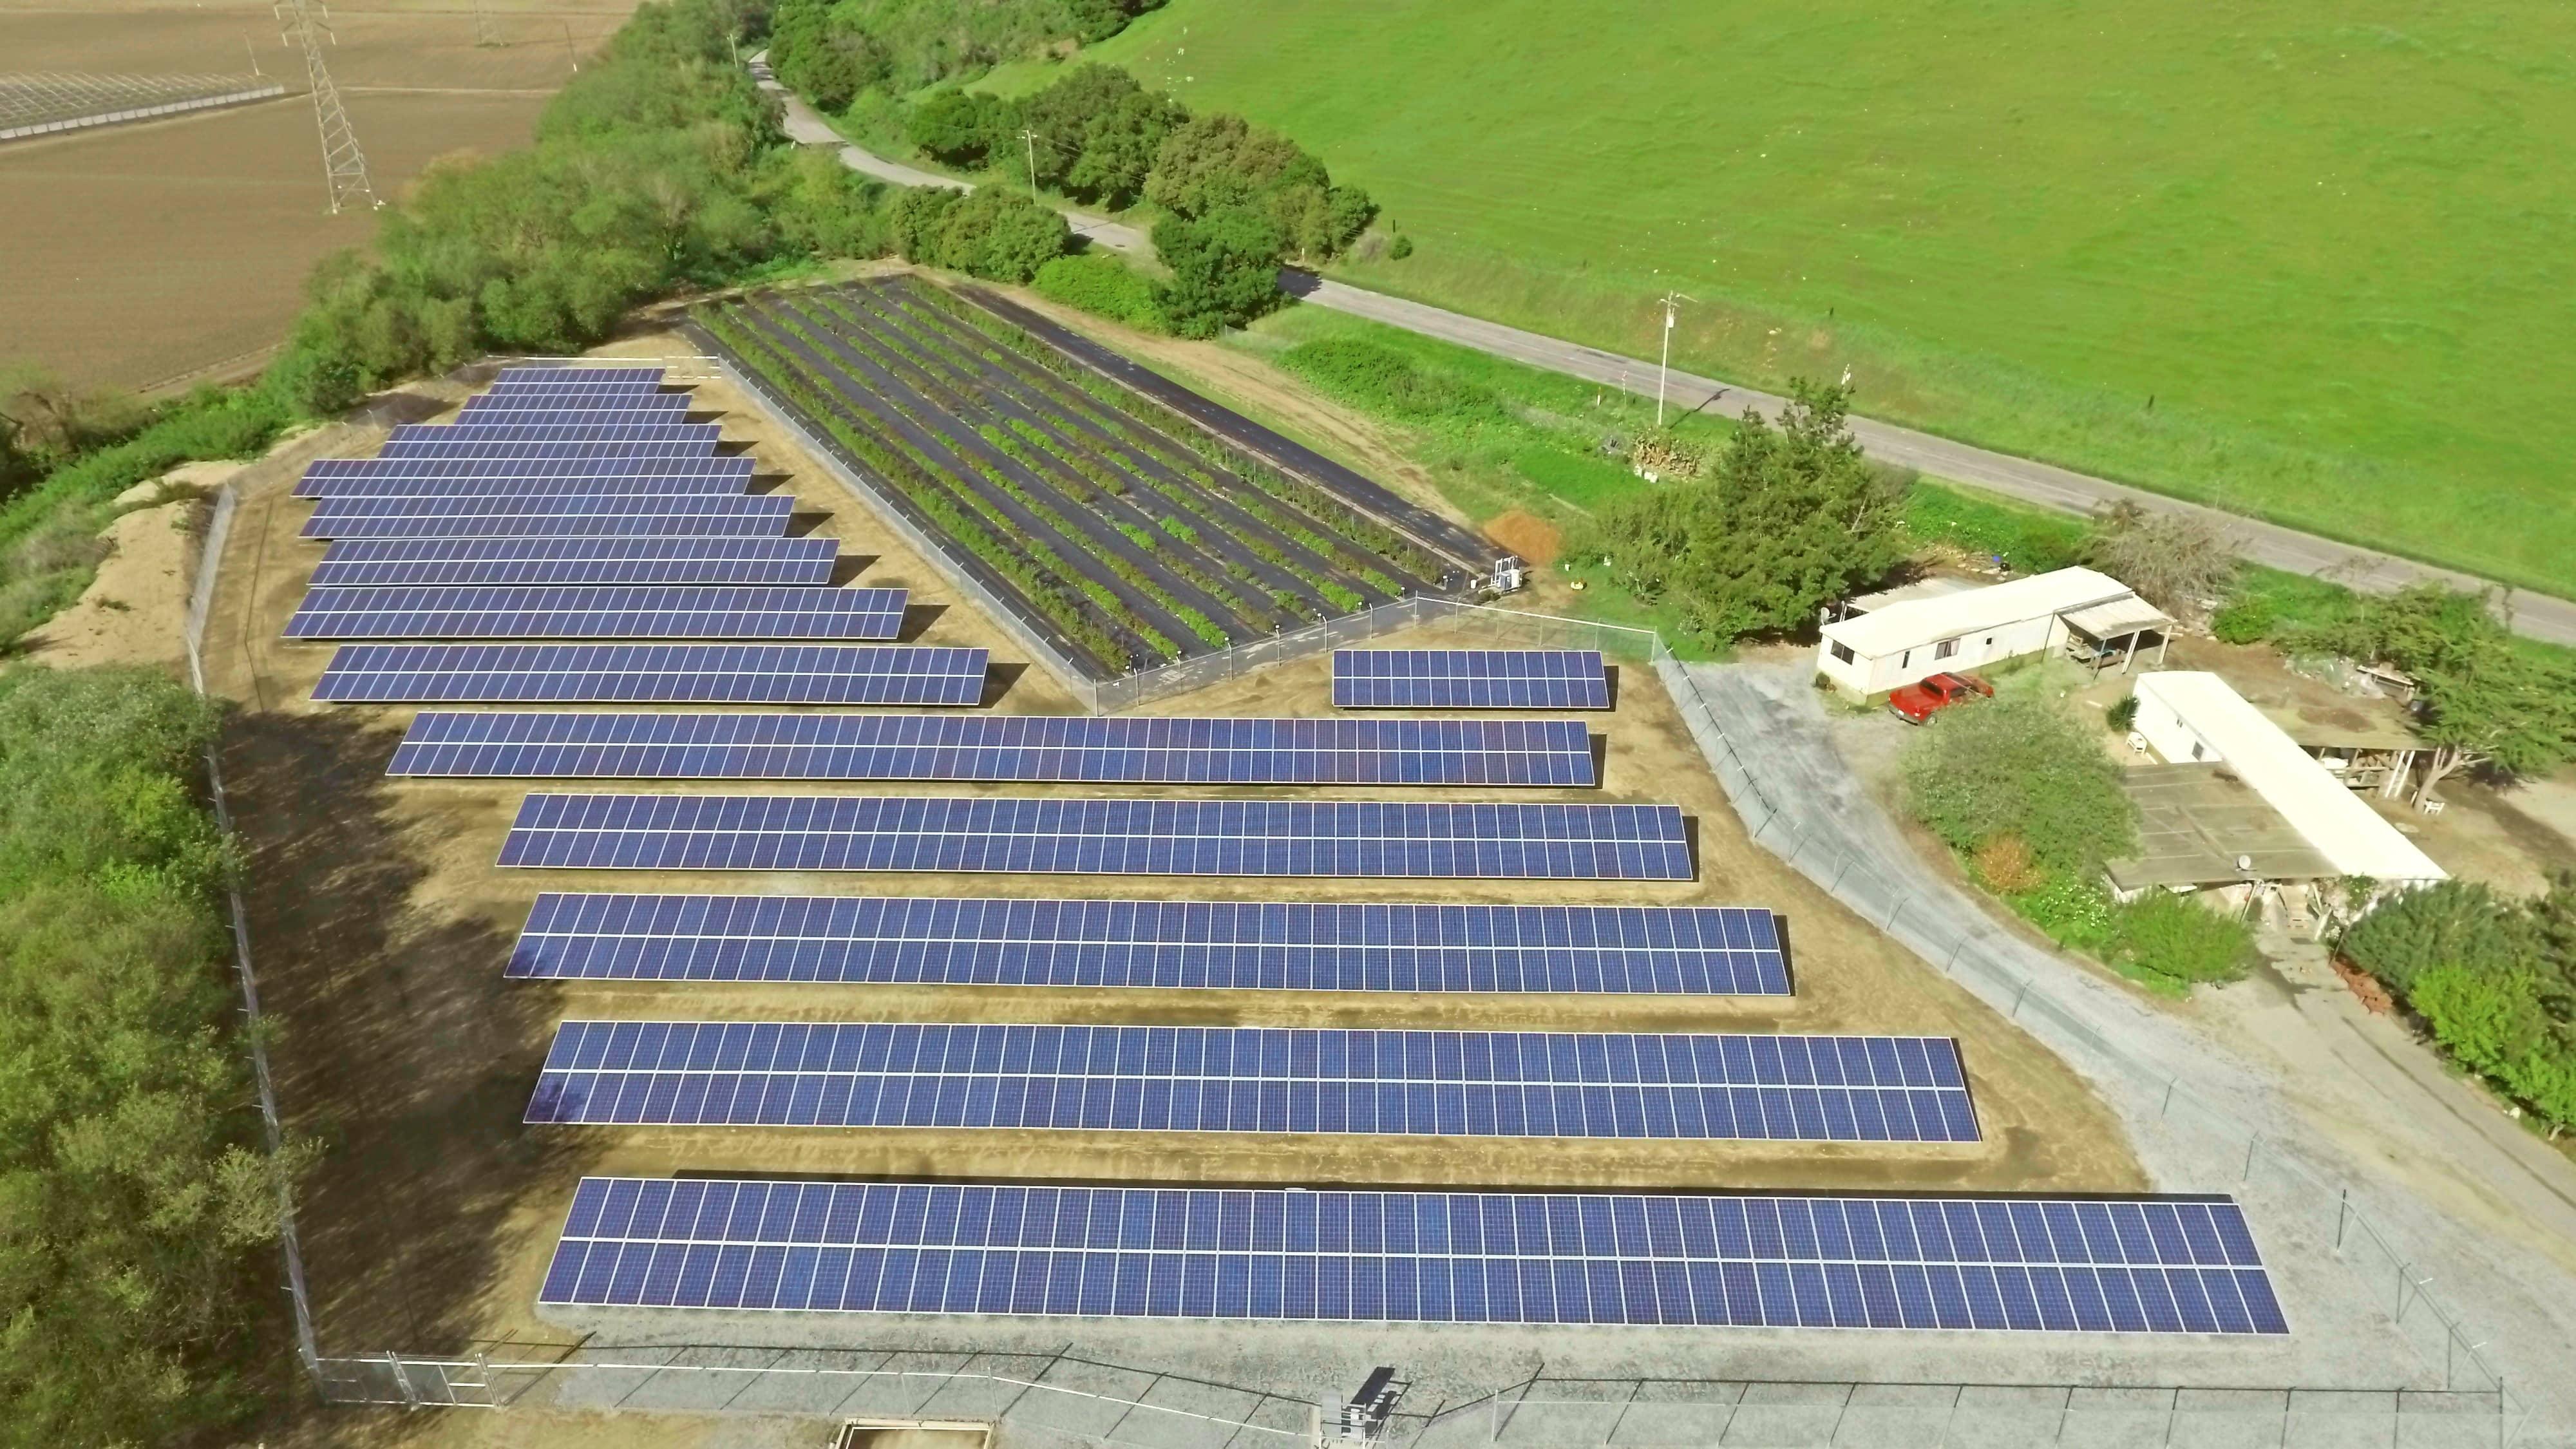 3836641 California Floral Company Goes Solar, Expects Savings